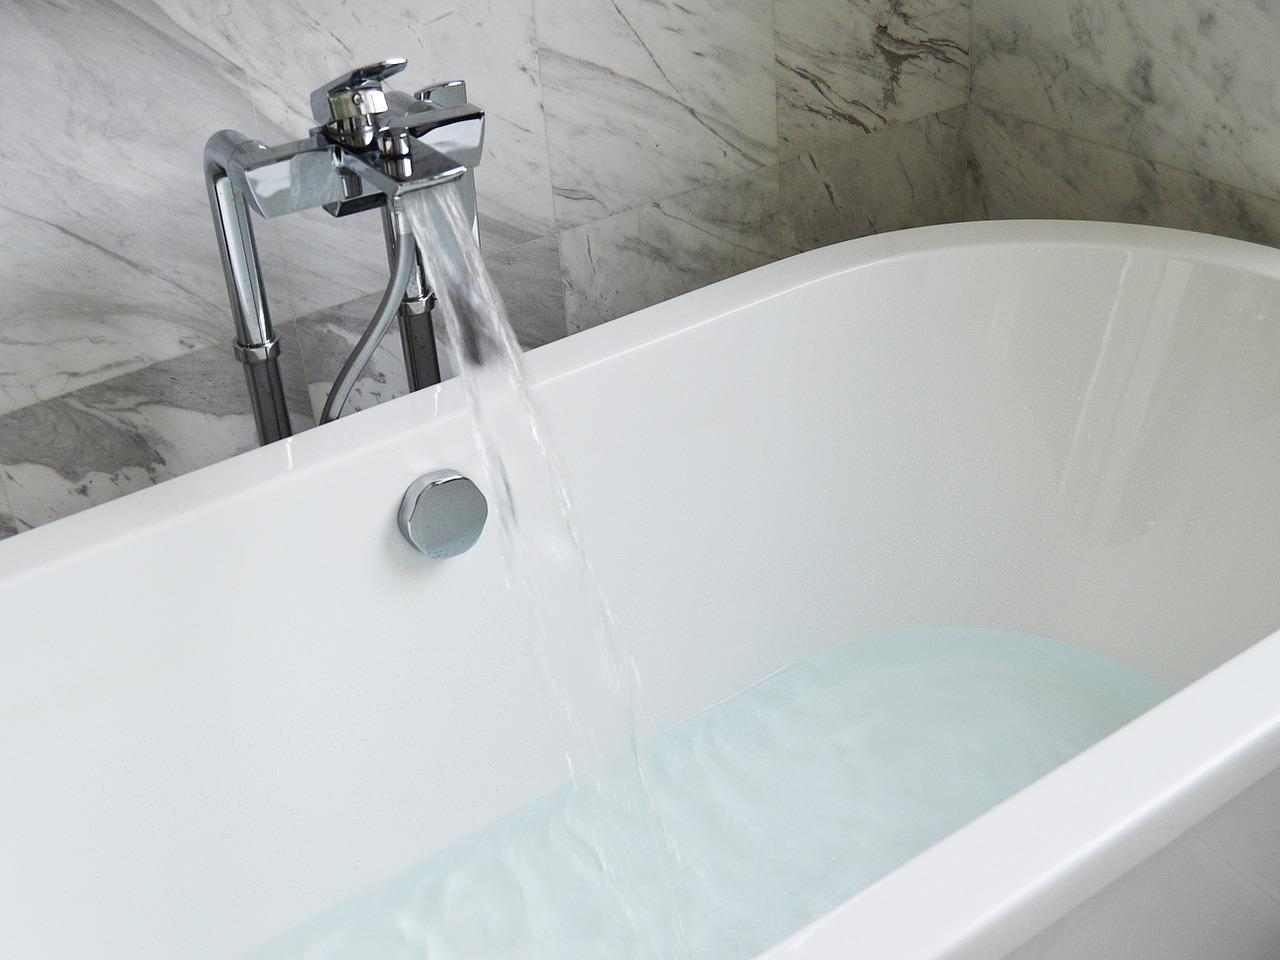 Vasca Da Bagno Standard Prezzi : Vasche da bagno tutto su modelli misure e prezzi